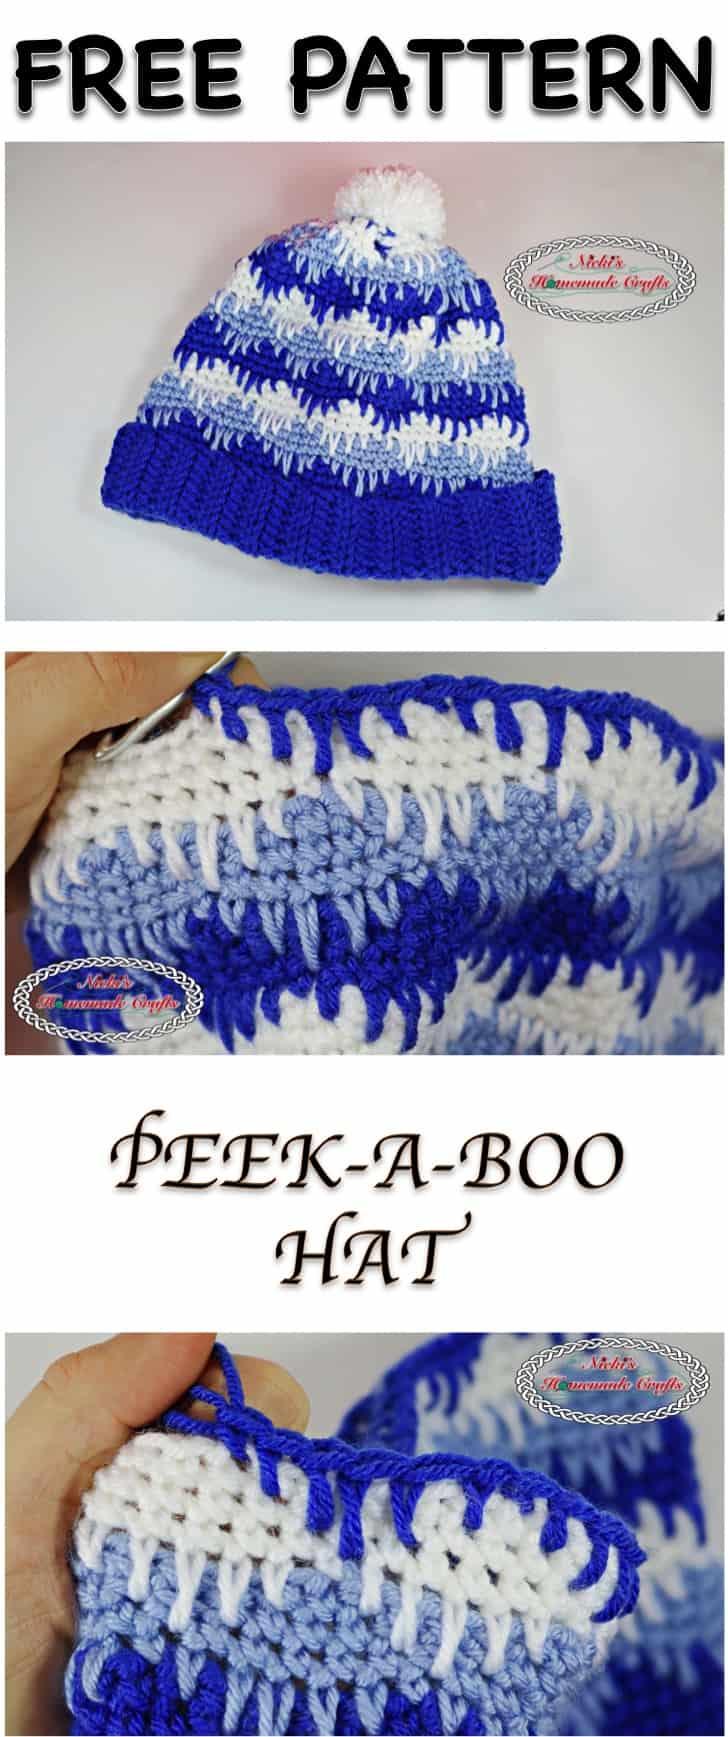 PEEK-A-BOO Hat Free Pattern